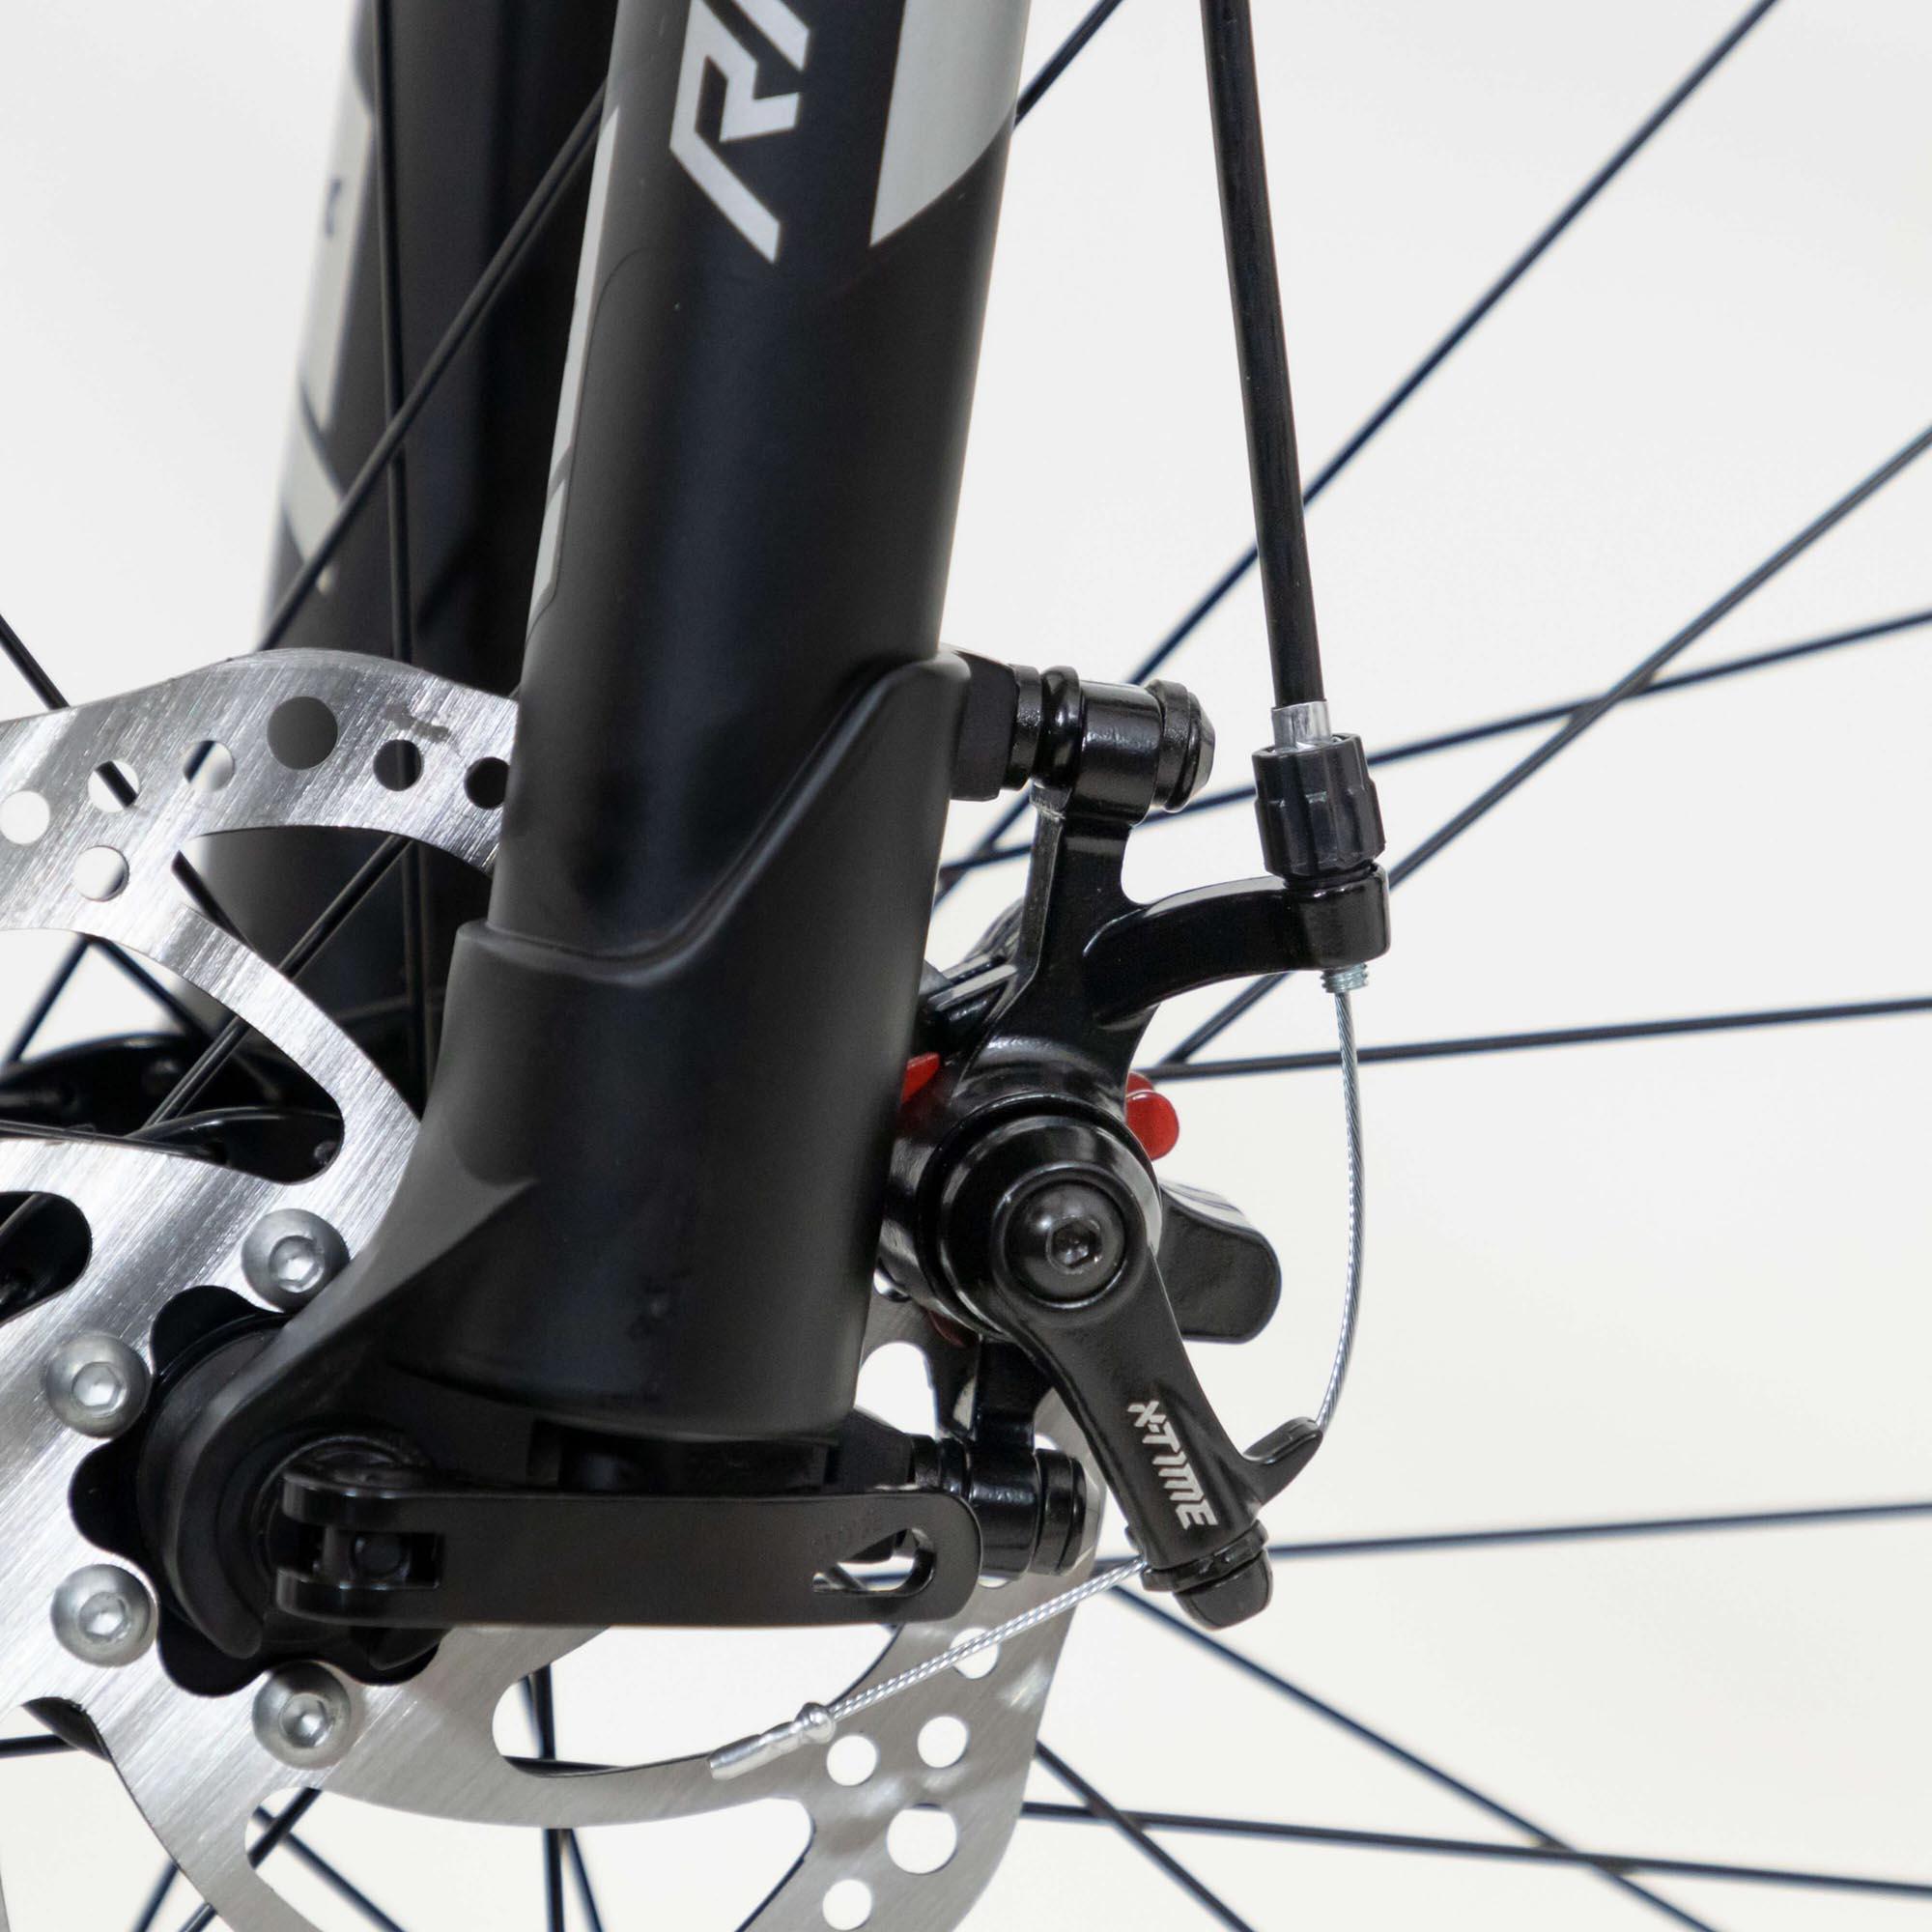 Bicicleta Aro 29 Pressure 24v X-Time - Rava